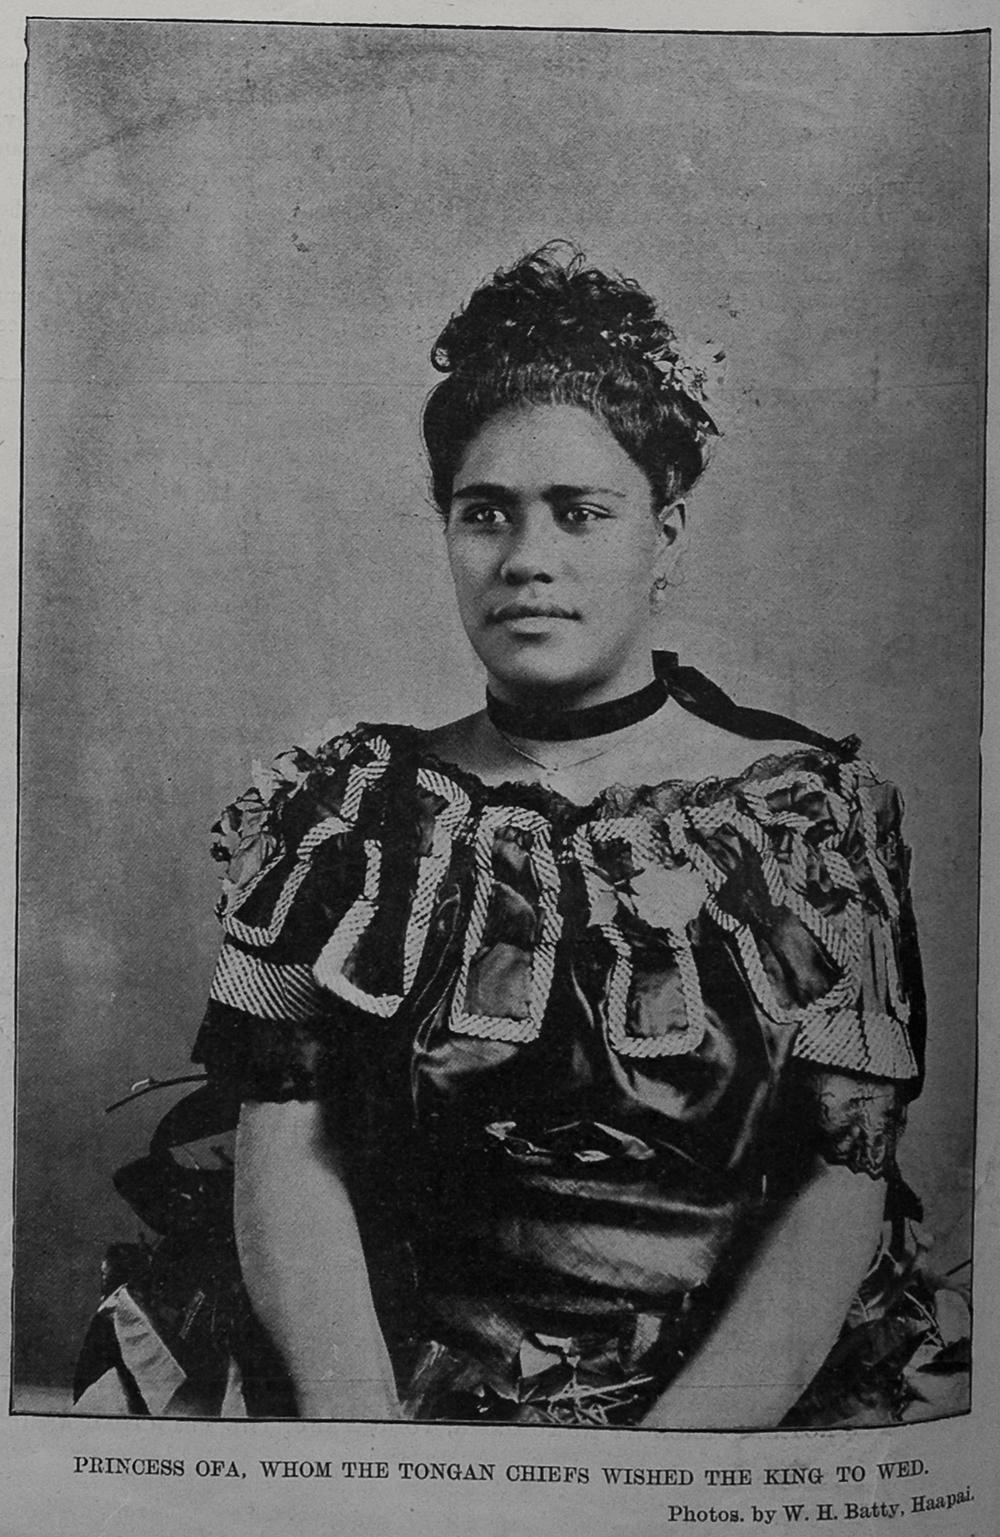 FilePrincess Ofa whom the Tongan chiefs wished the king